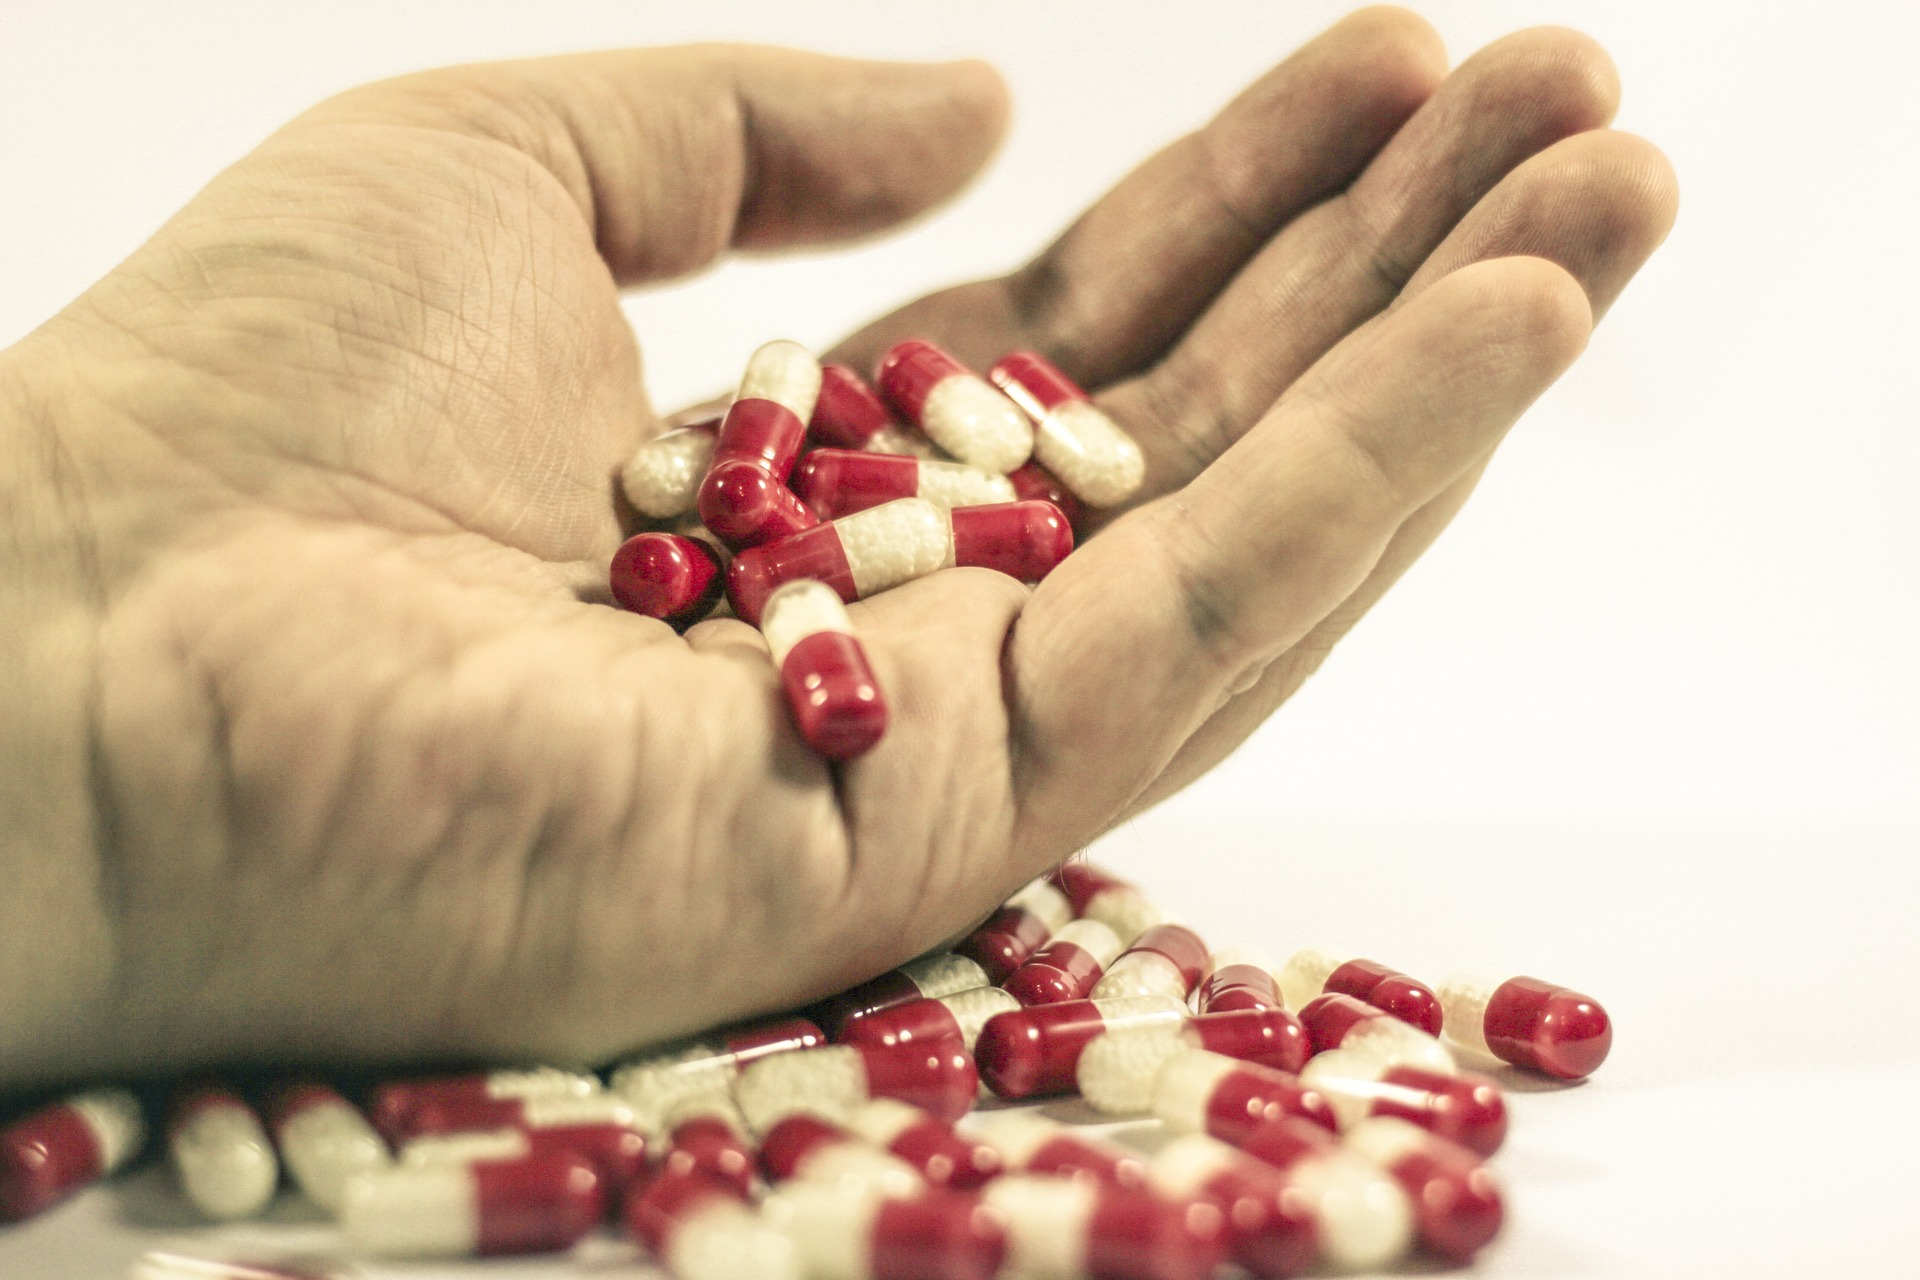 Cure Drug  by frolicsomepl via Pixabay (Public Domain)